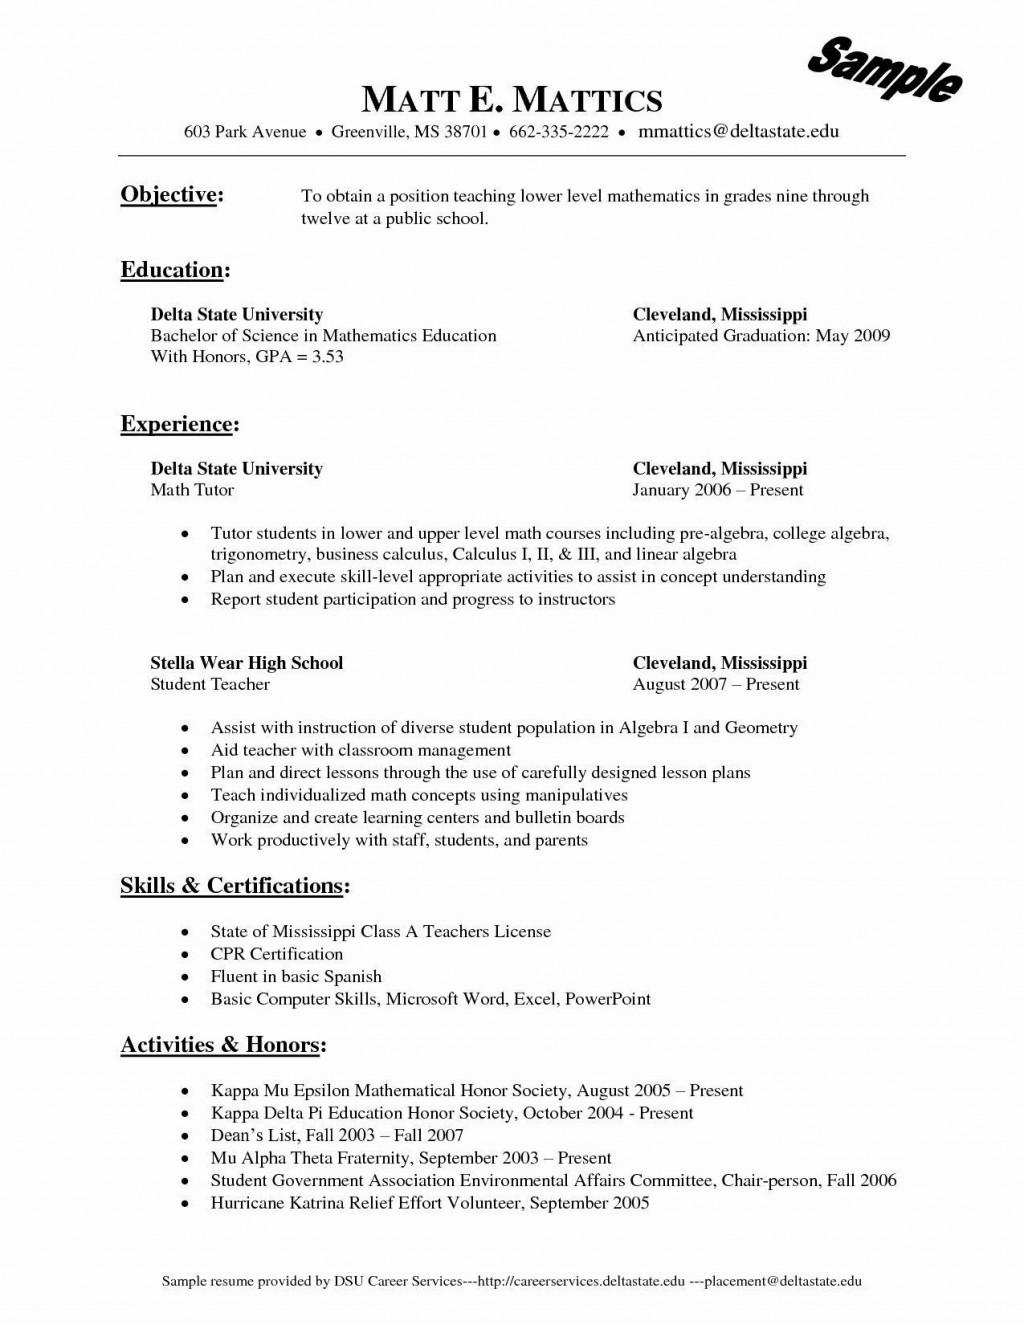 002 Remarkable Resume Template For Wordpad Image  Free Cv DownloadLarge